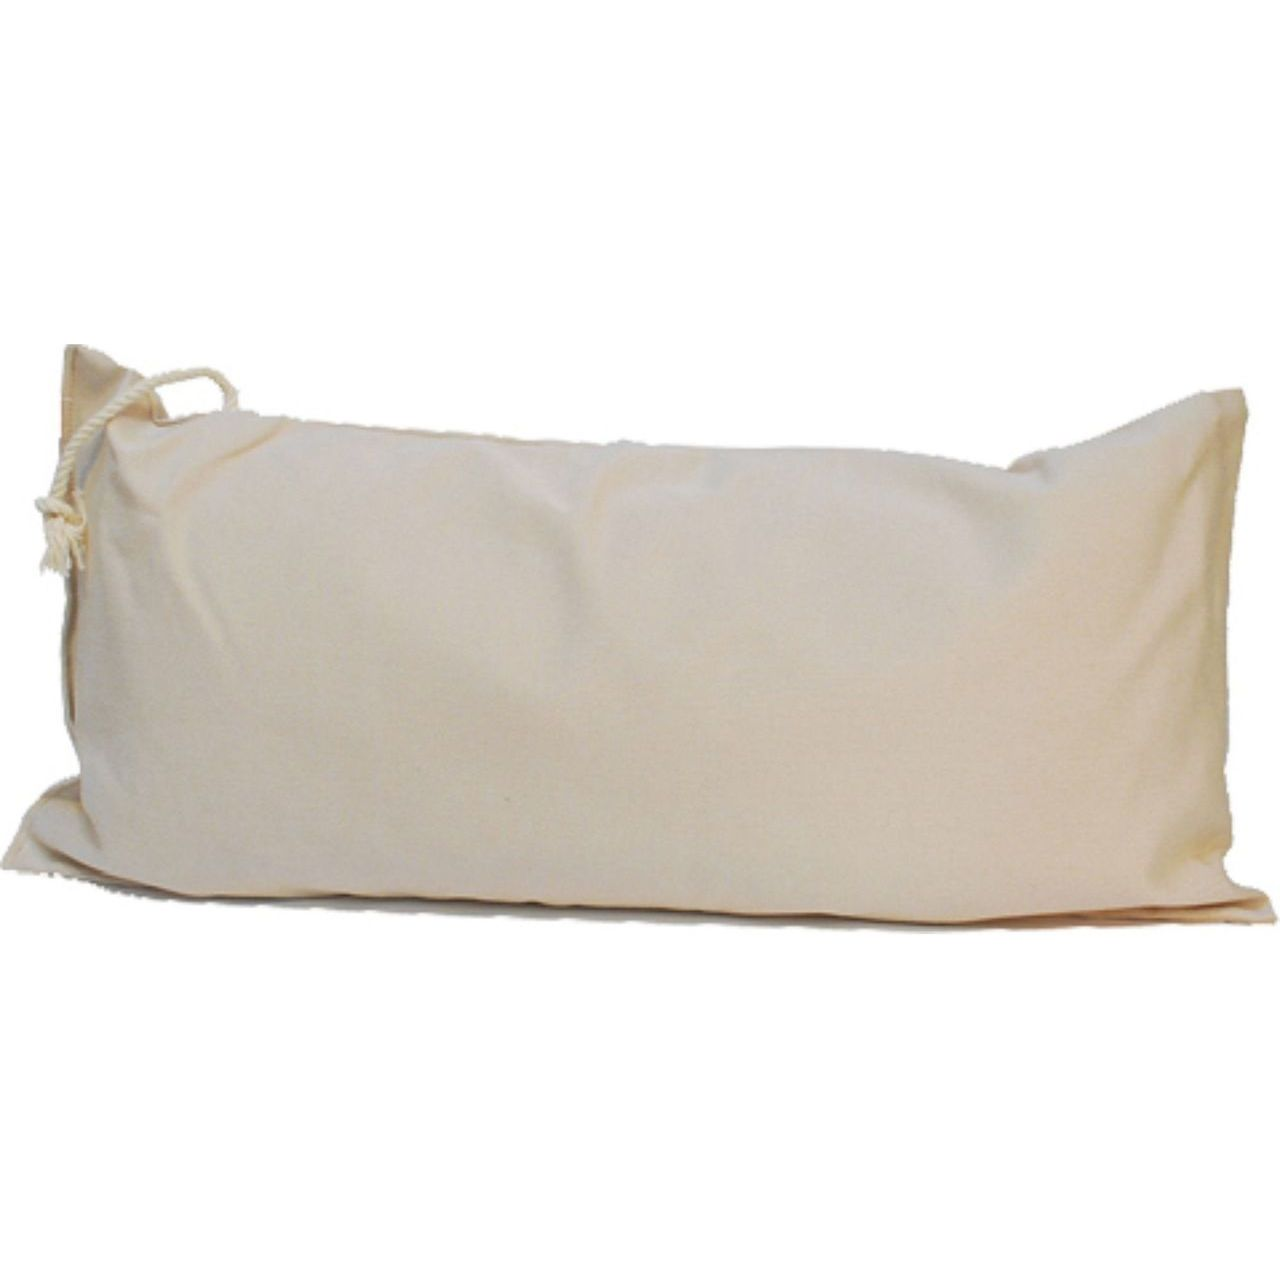 Gleason Deluxe Hammock Pillow - Natural